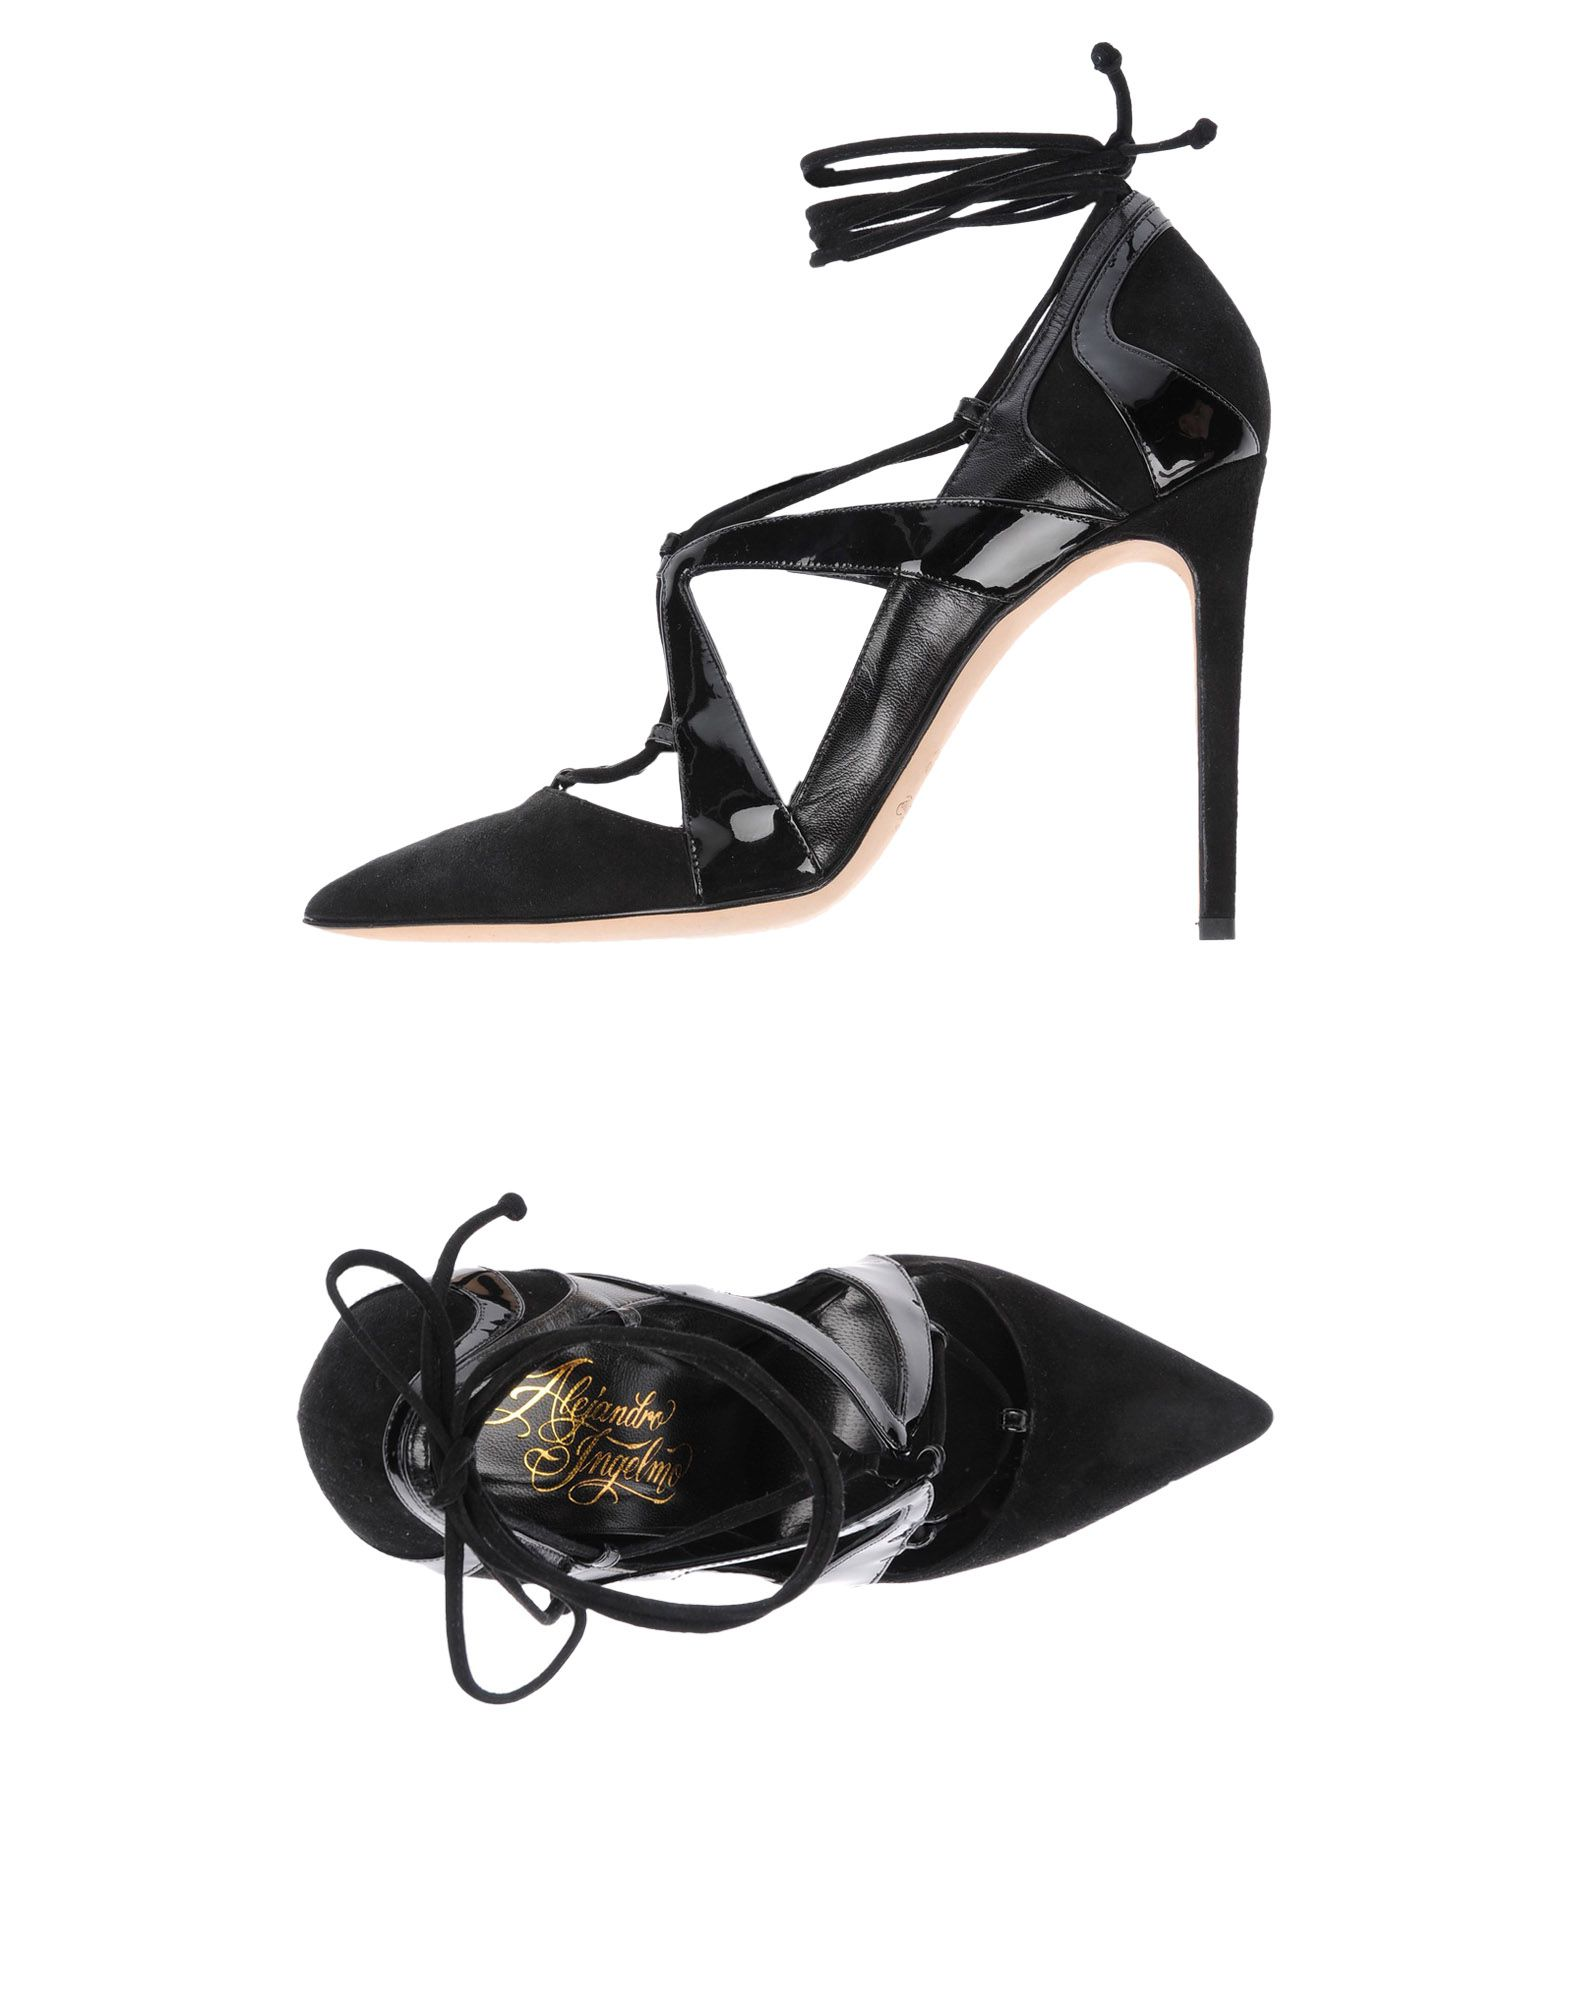 Rabatt Schuhe Alejandro Ingelmo Pumps 11472325LI Damen  11472325LI Pumps c0e78a